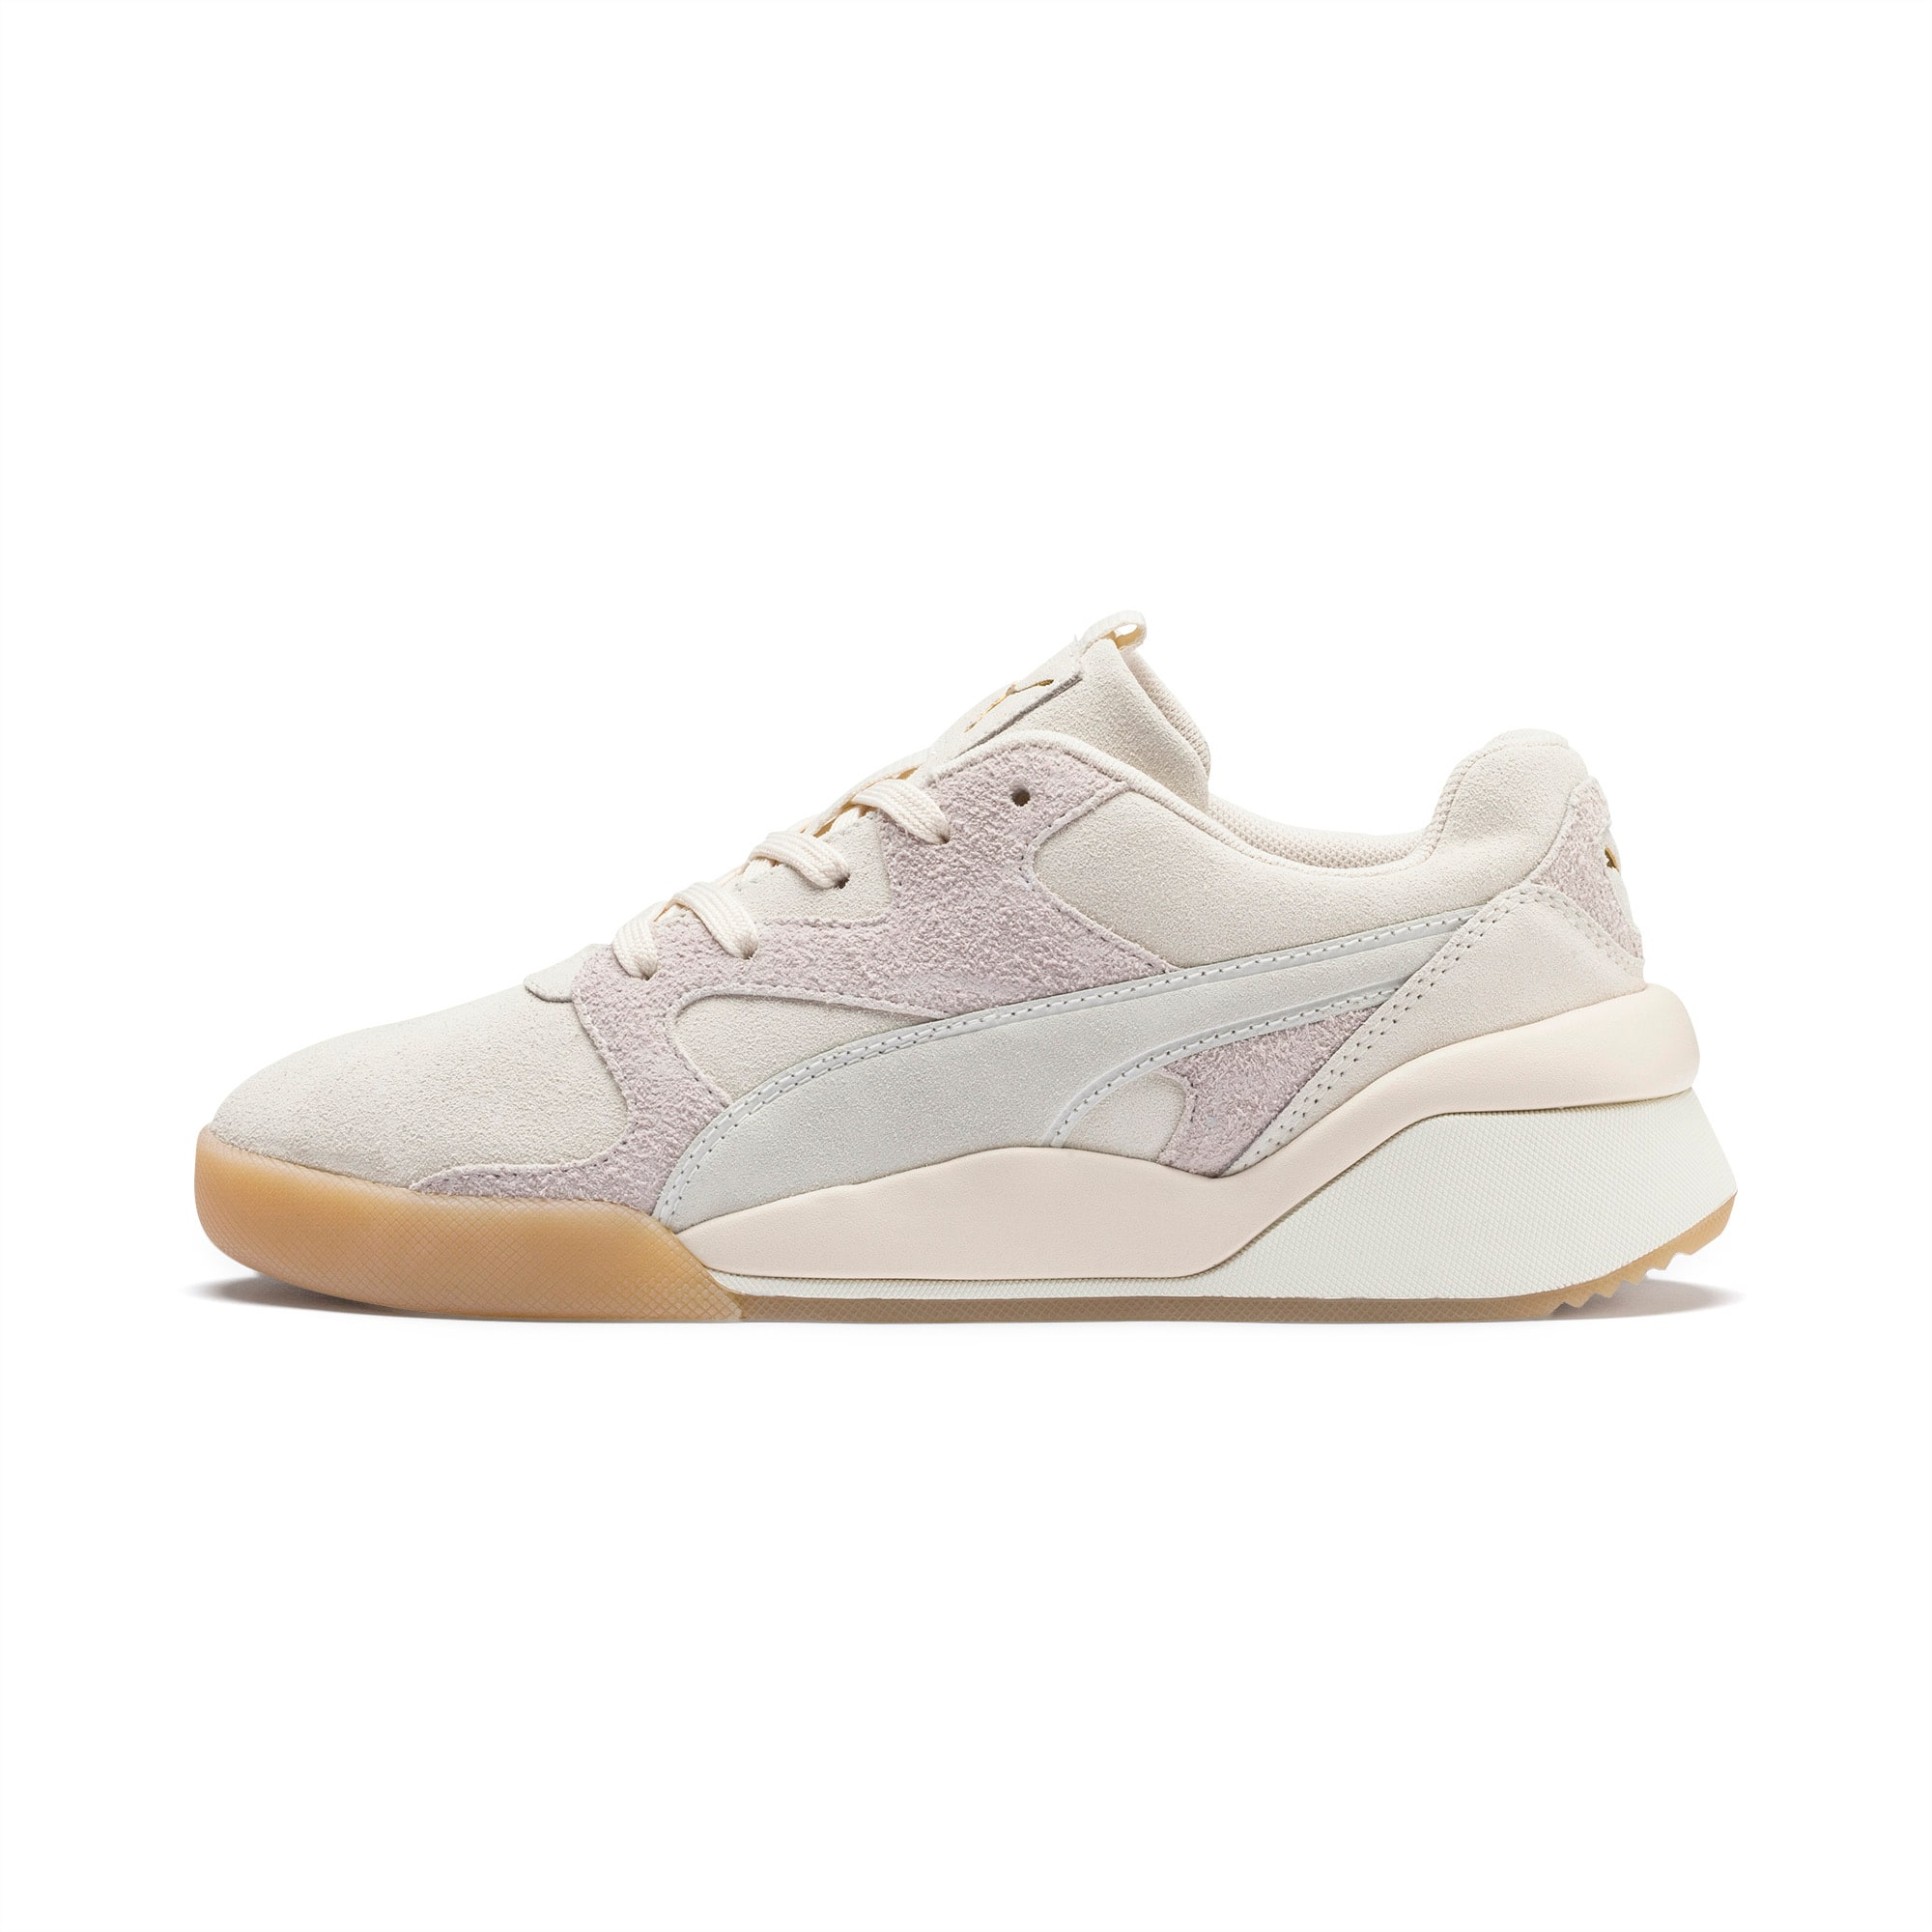 Aeon Rewind Women's Sneakers | PUMA US